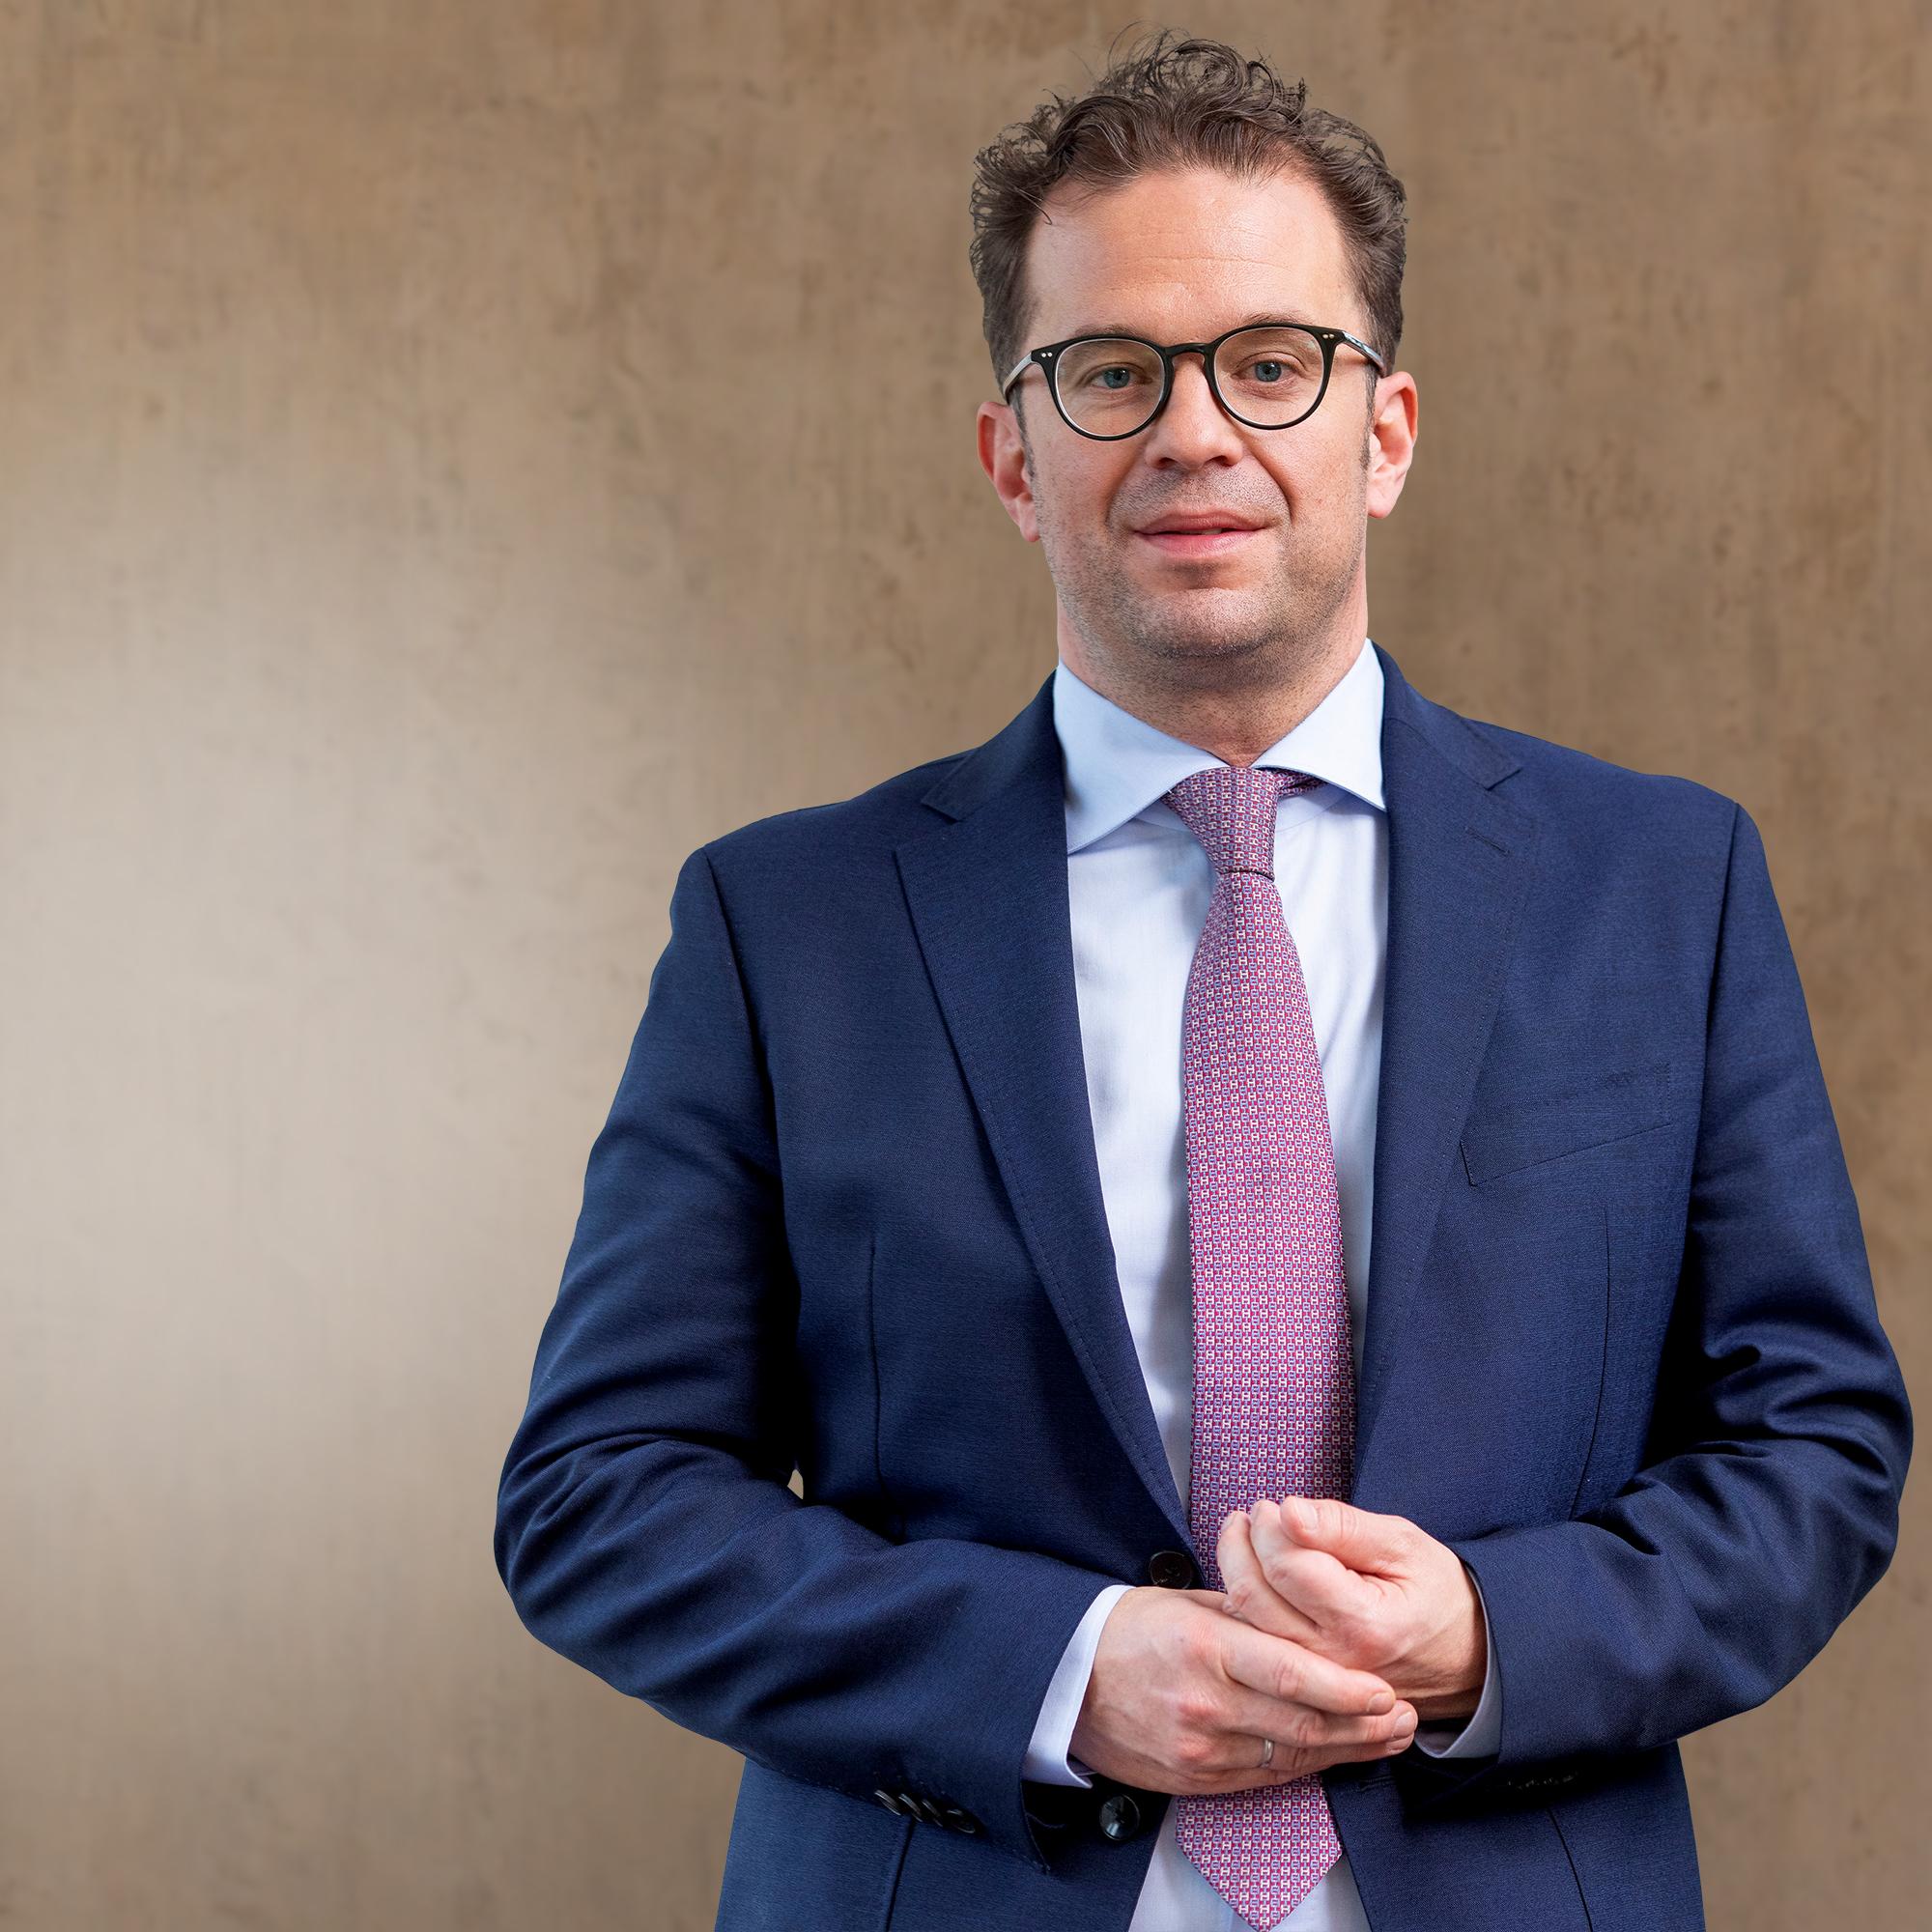 Jan Markus Plathner